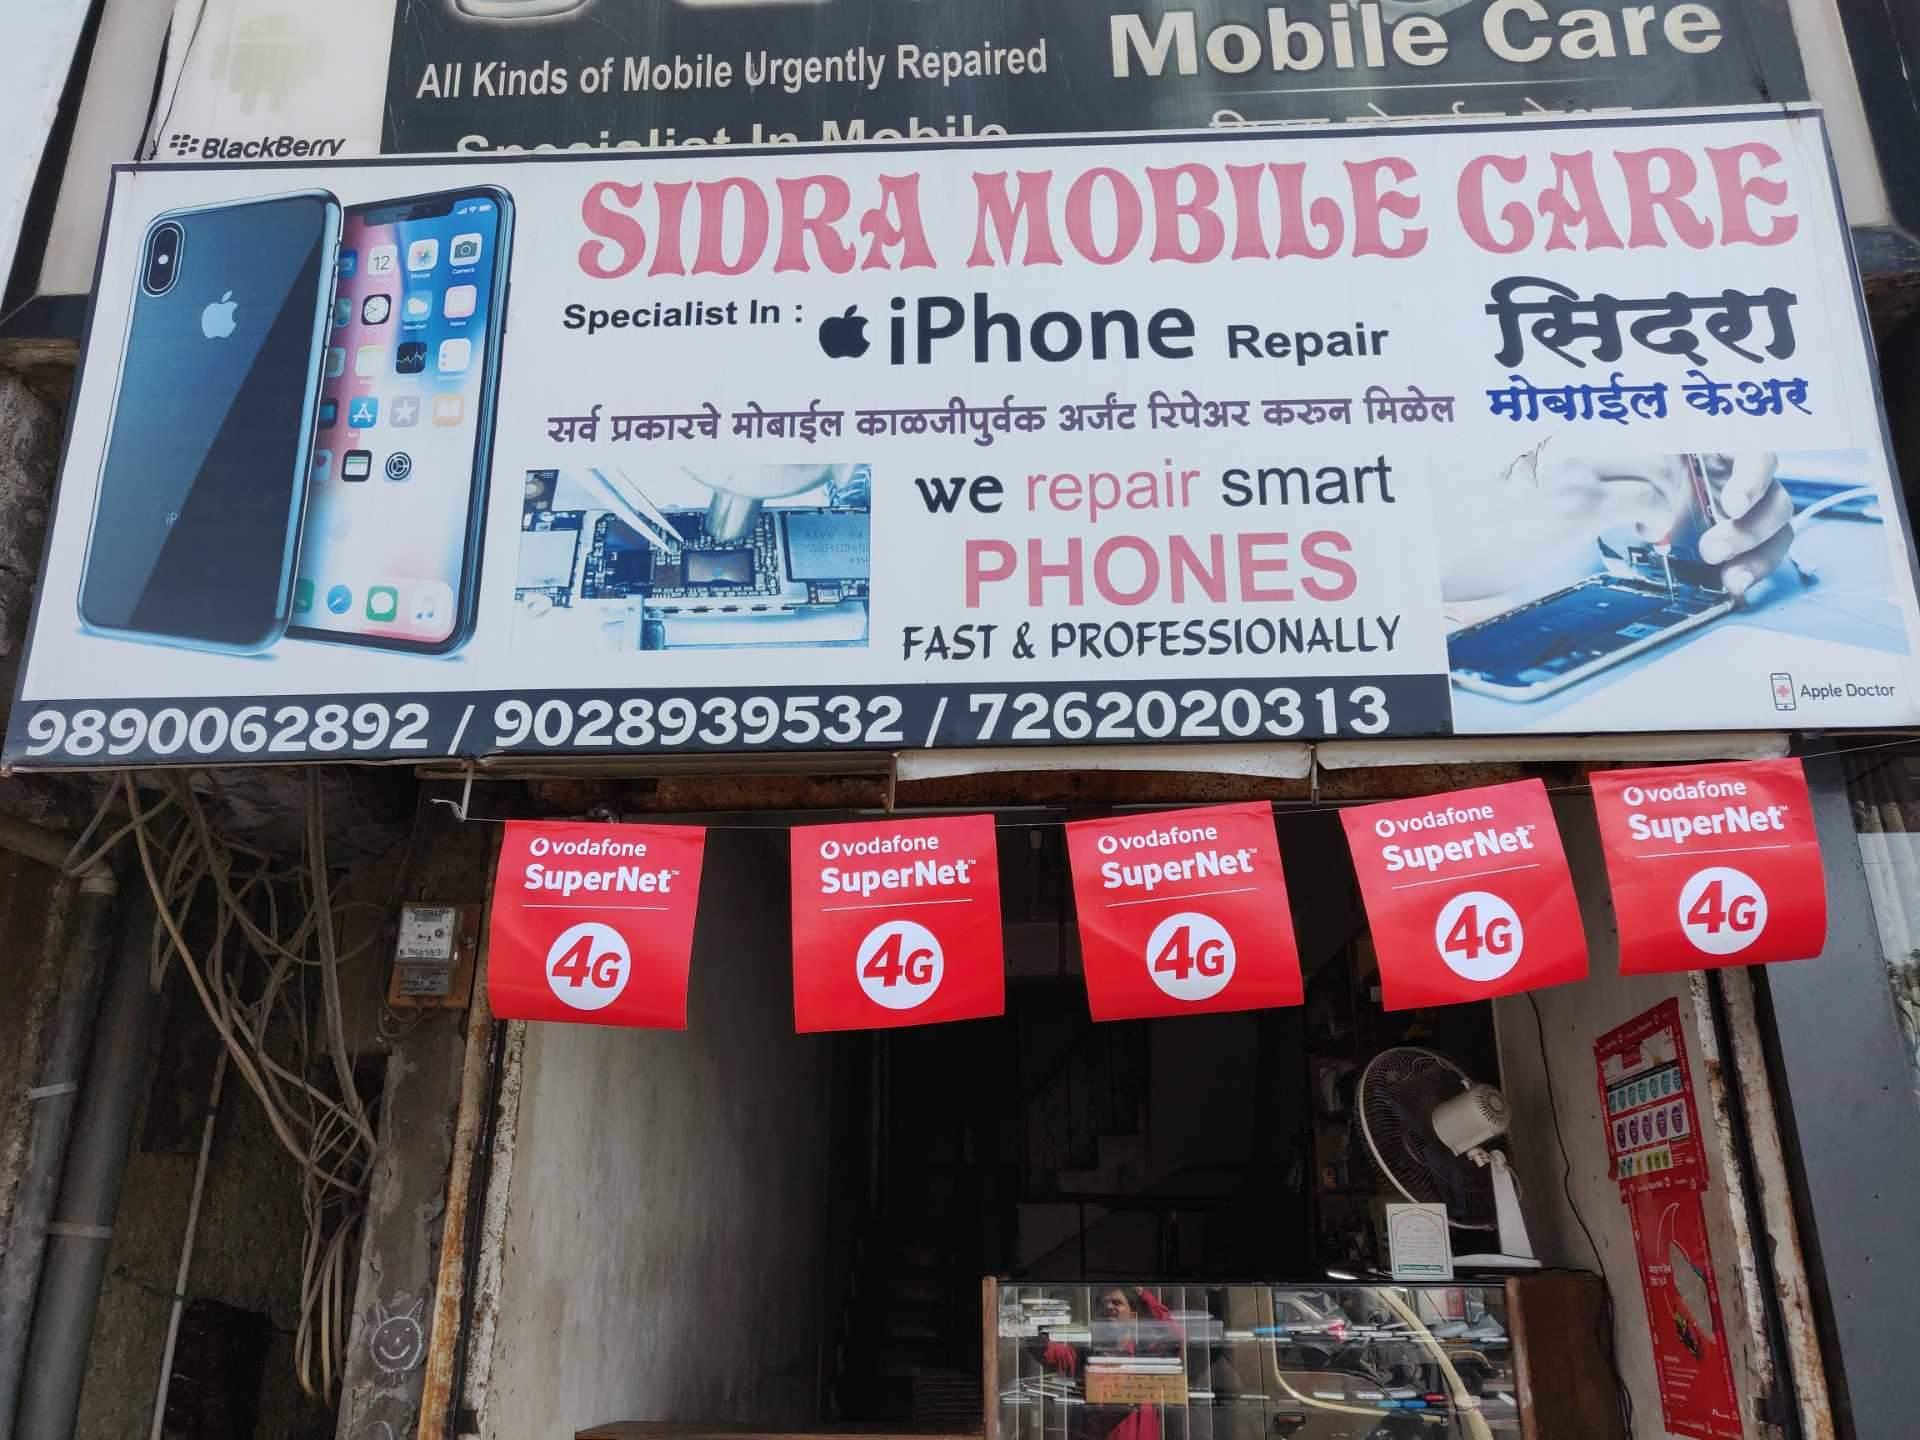 Sidra Mobile Care Photos, Yerawada, Pune - Iphone 5 , HD Wallpaper & Backgrounds